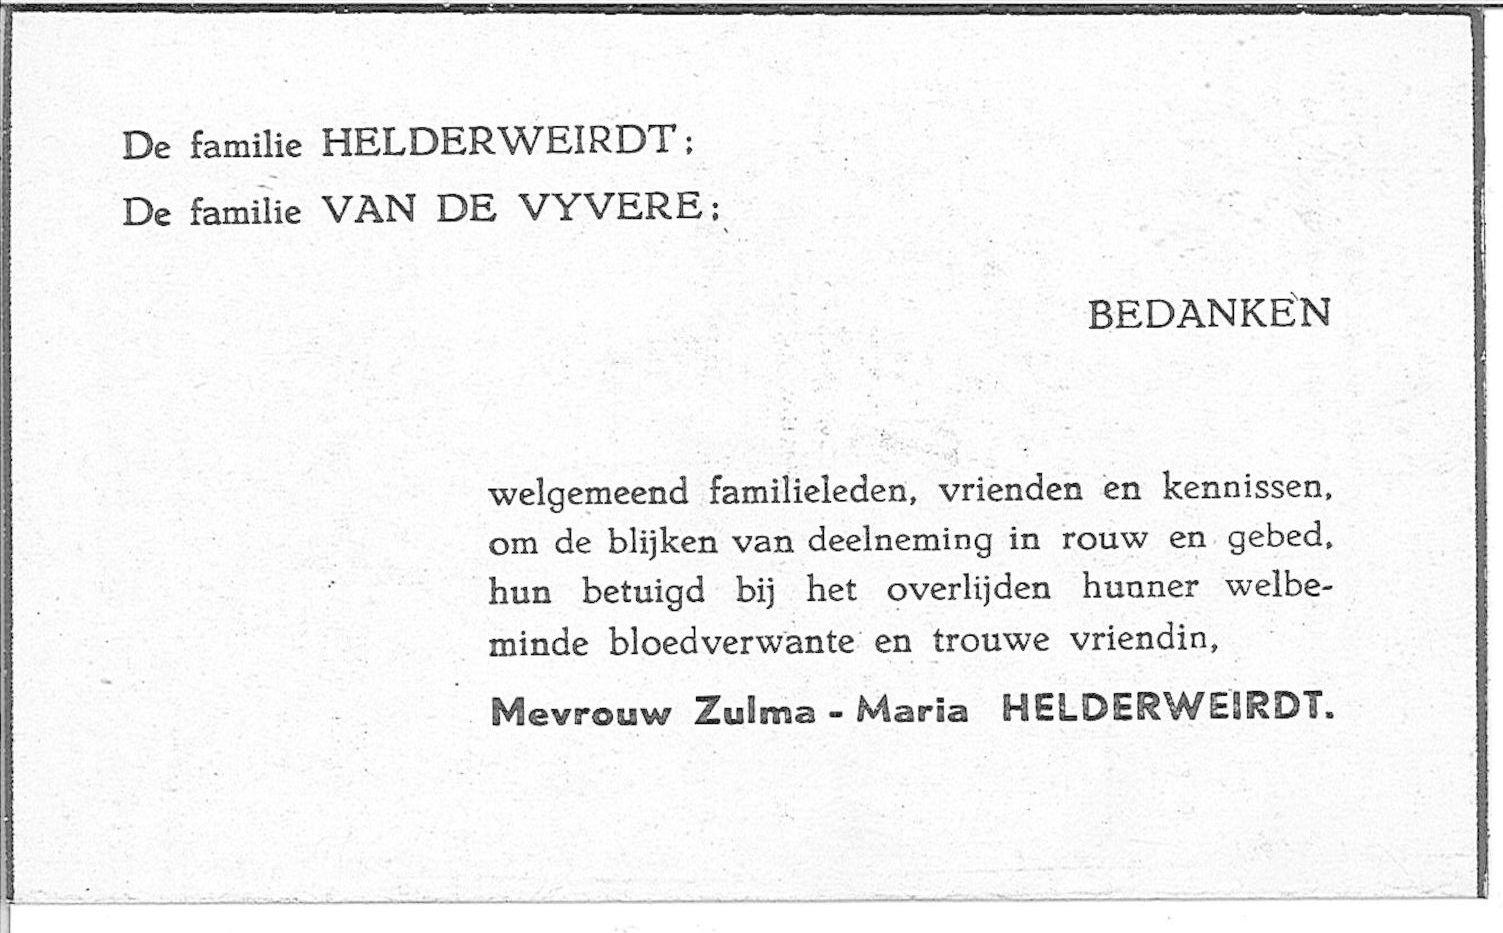 Zulma Helderweirdt